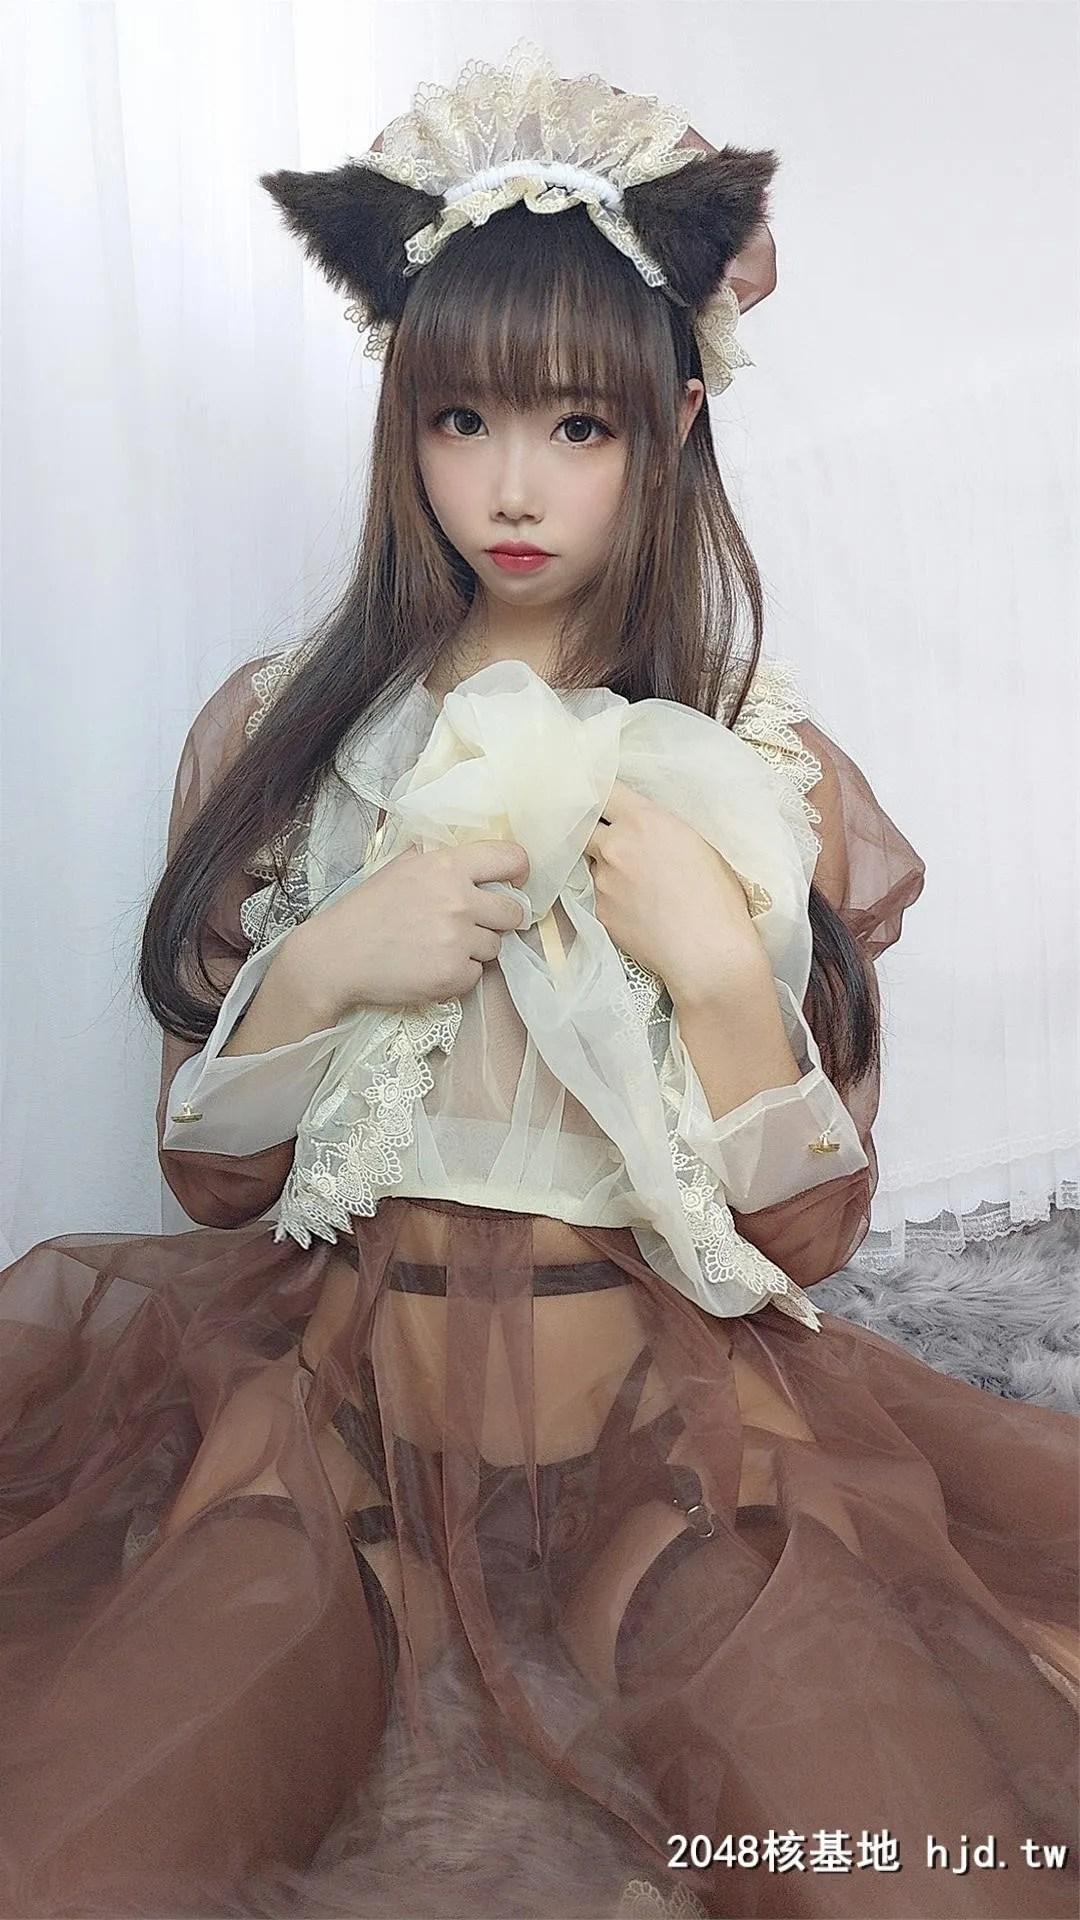 【Cos小姐姐雪琪】 透明女仆 [43P]插图(5)